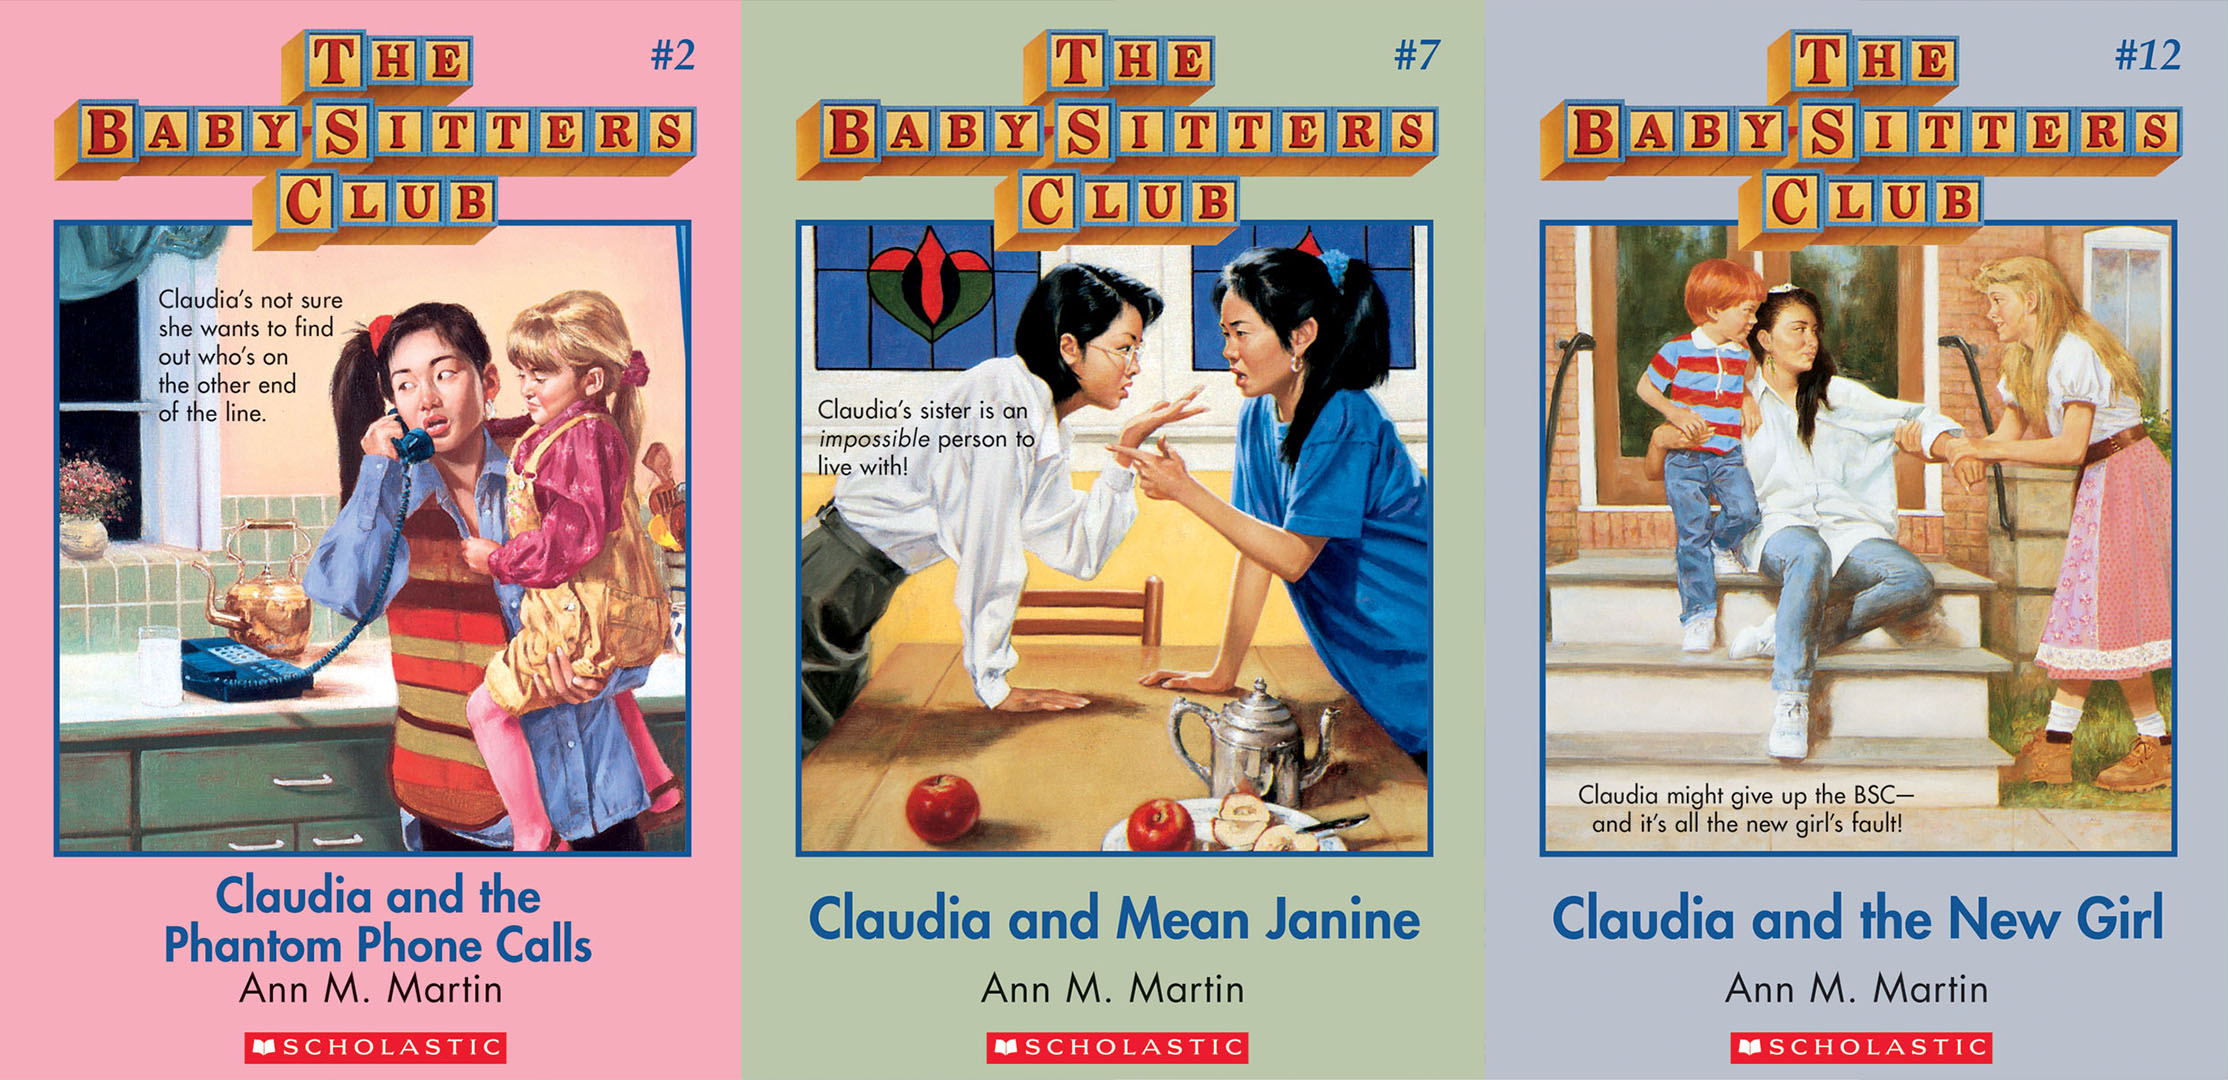 2020 model the baby sitters club 3 temmuzda netflixte basliyor GRqfm